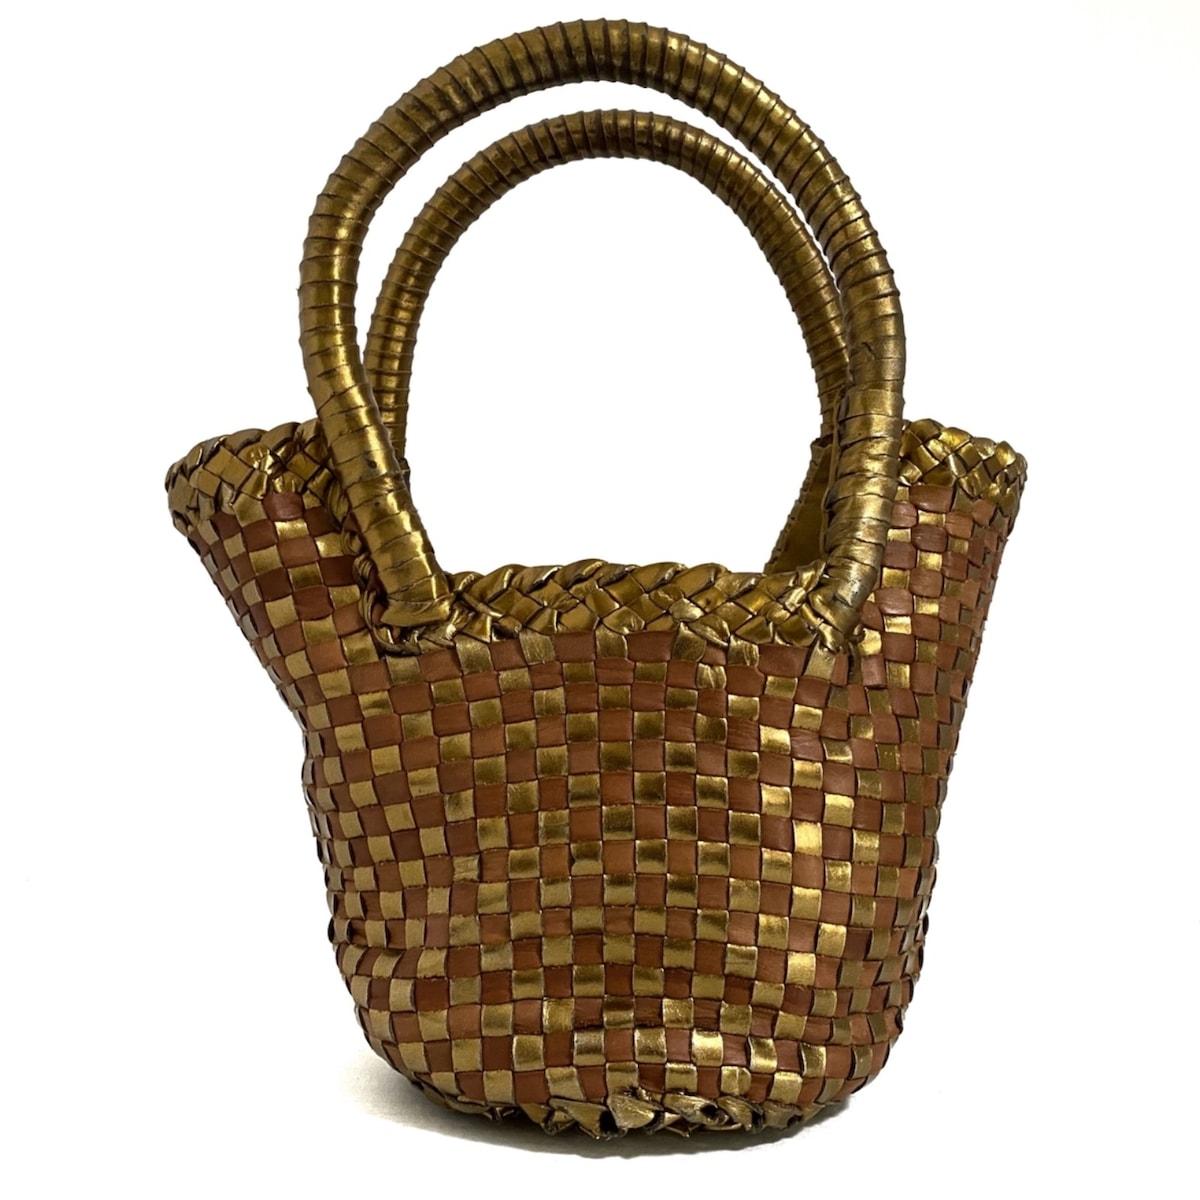 PAOLO MASI(パオロマージ)のハンドバッグ